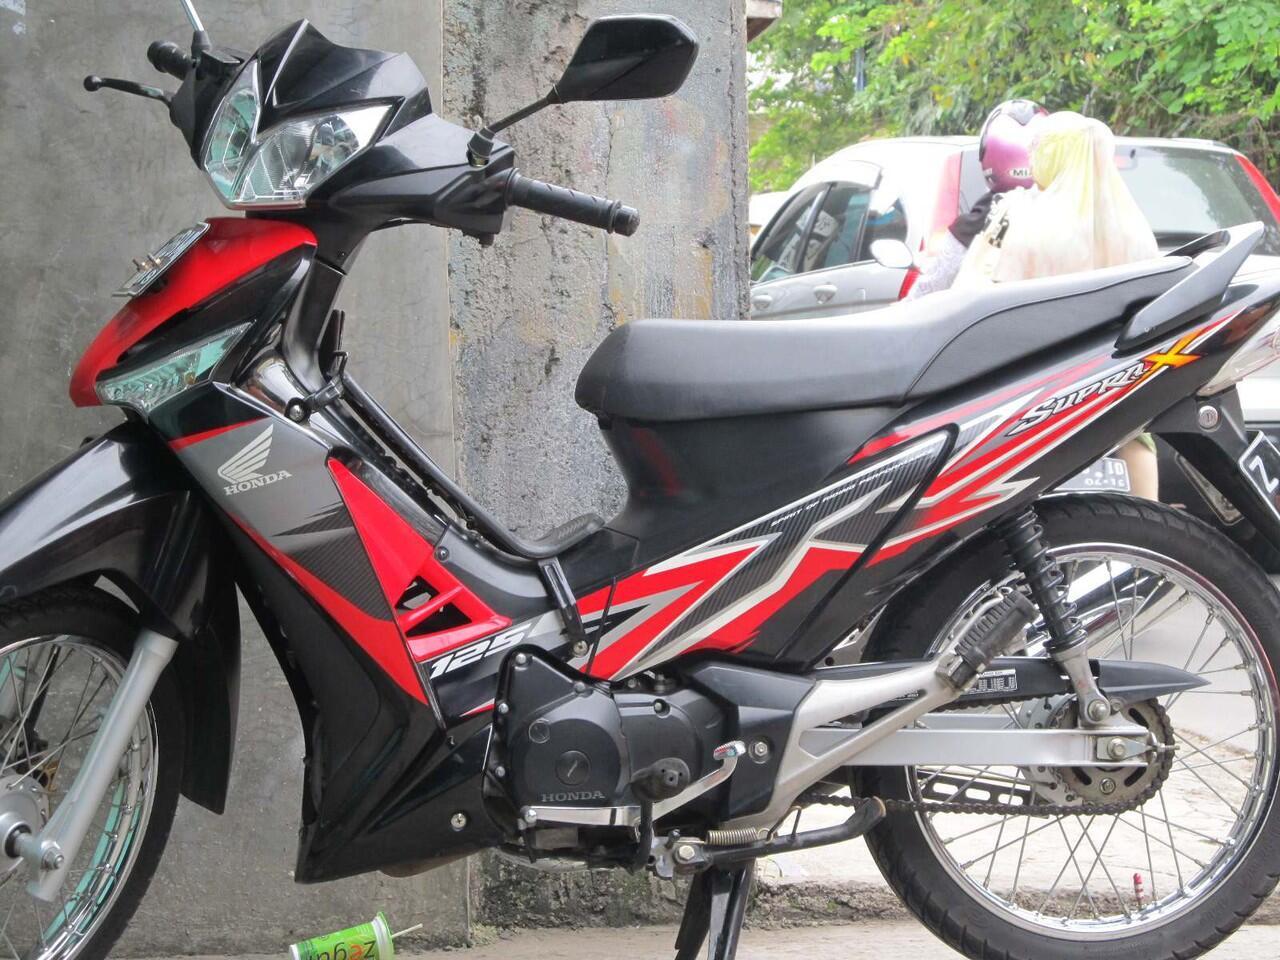 Supra X 125 2013